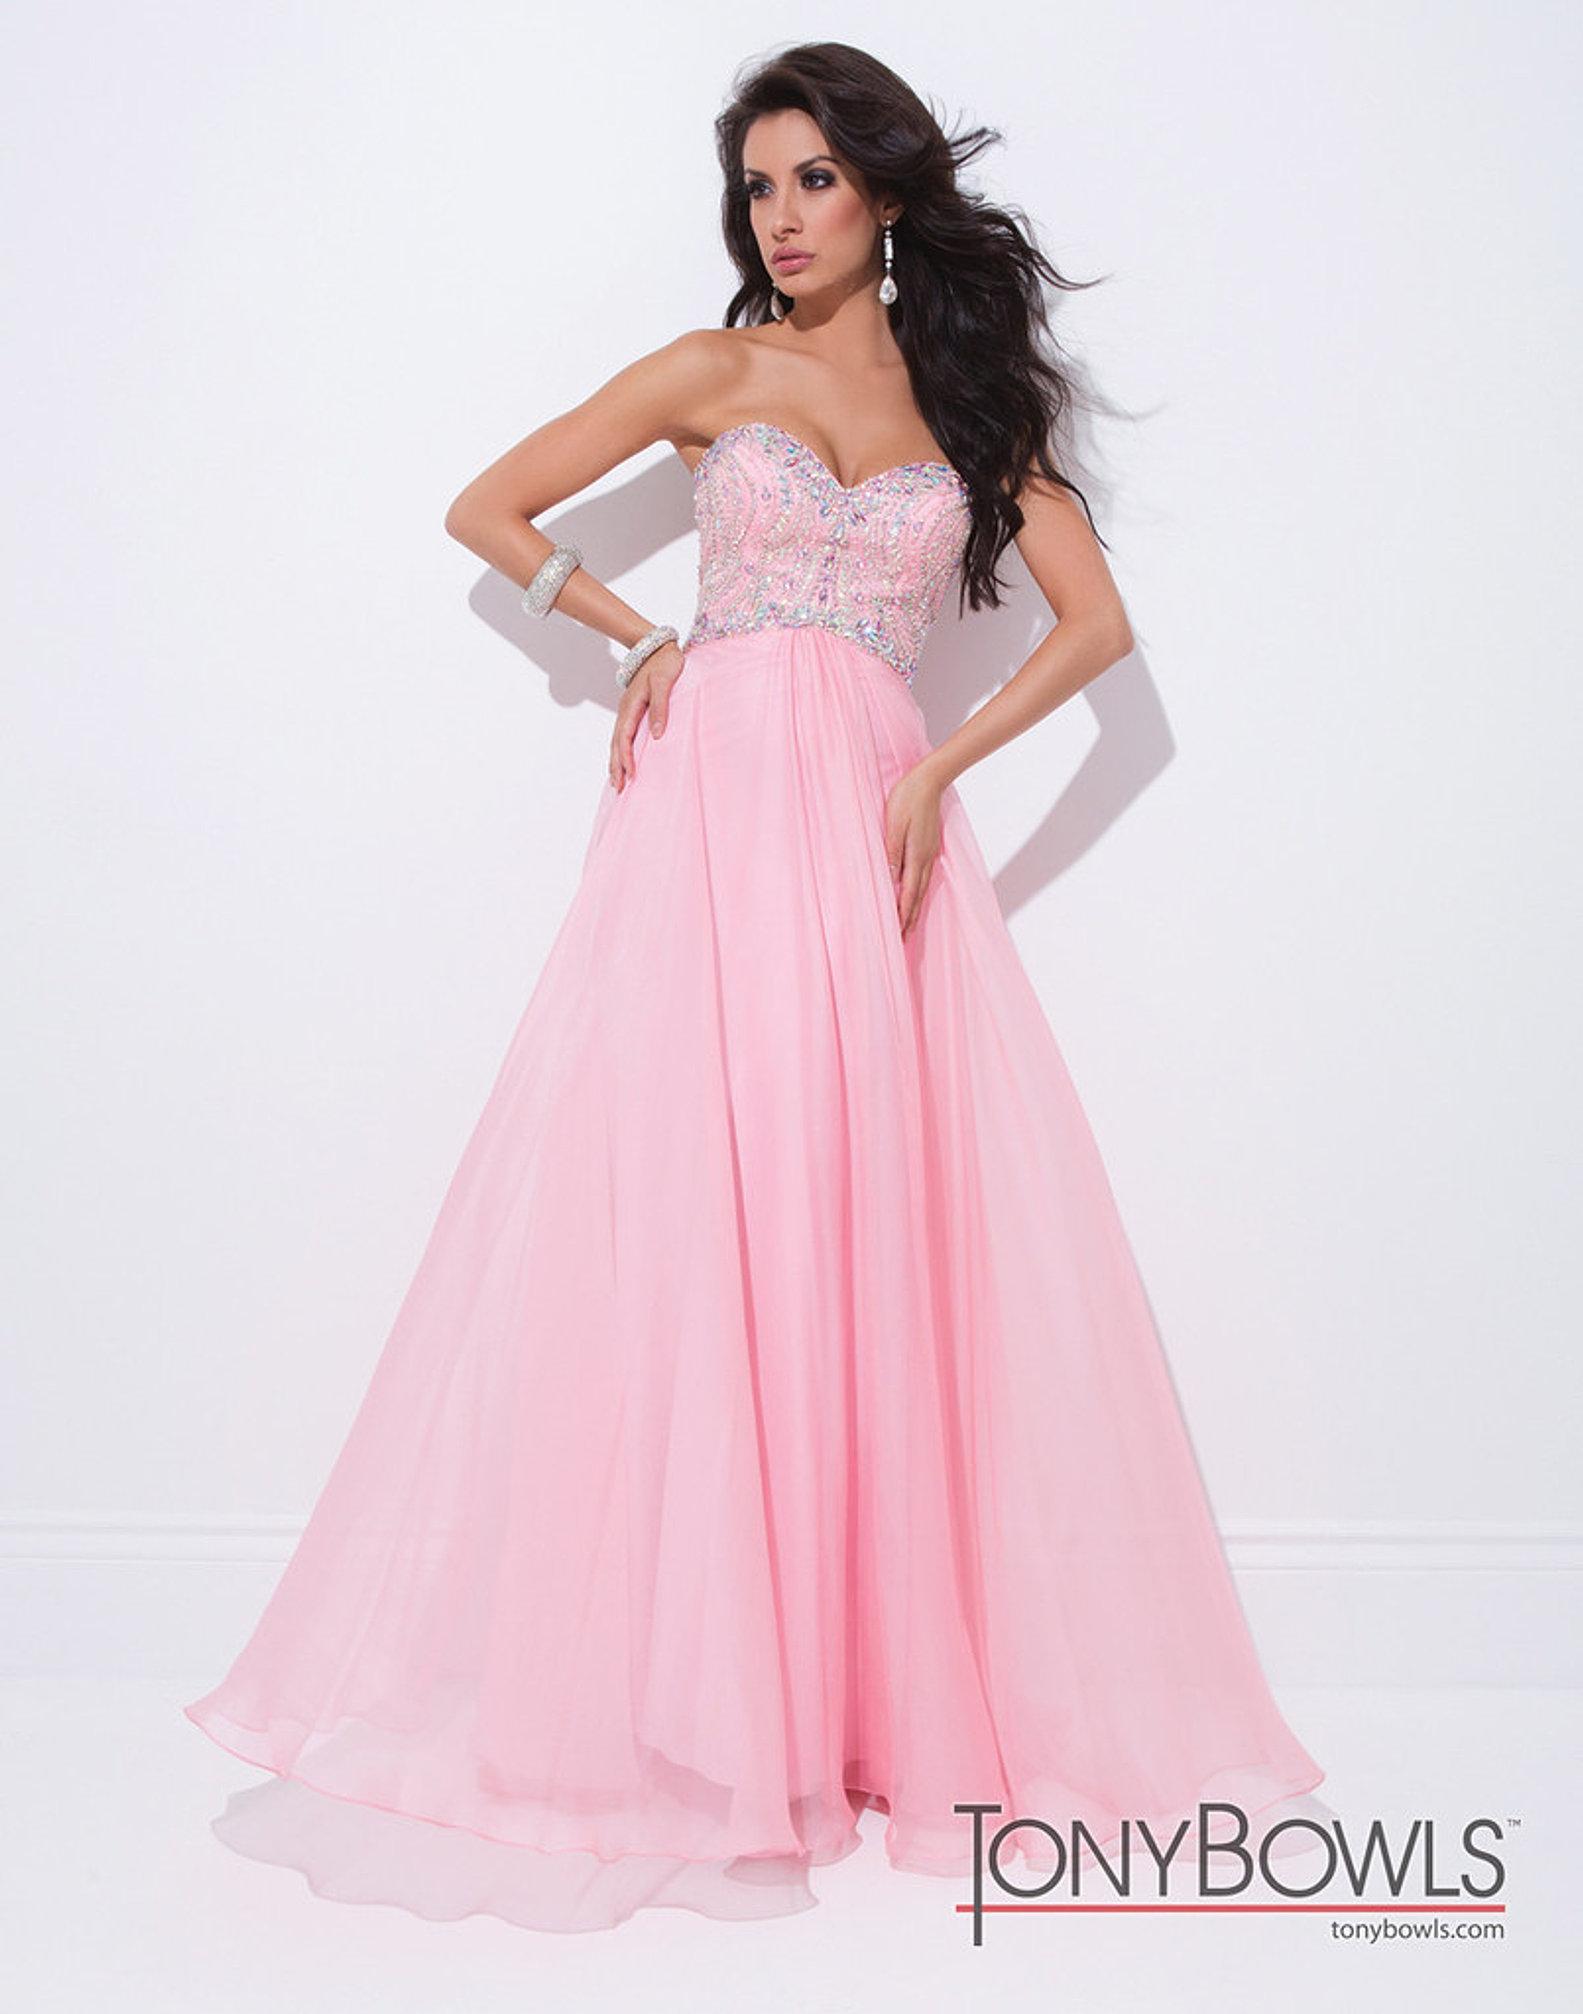 NOx Anabel Dresses 2014   Dress images